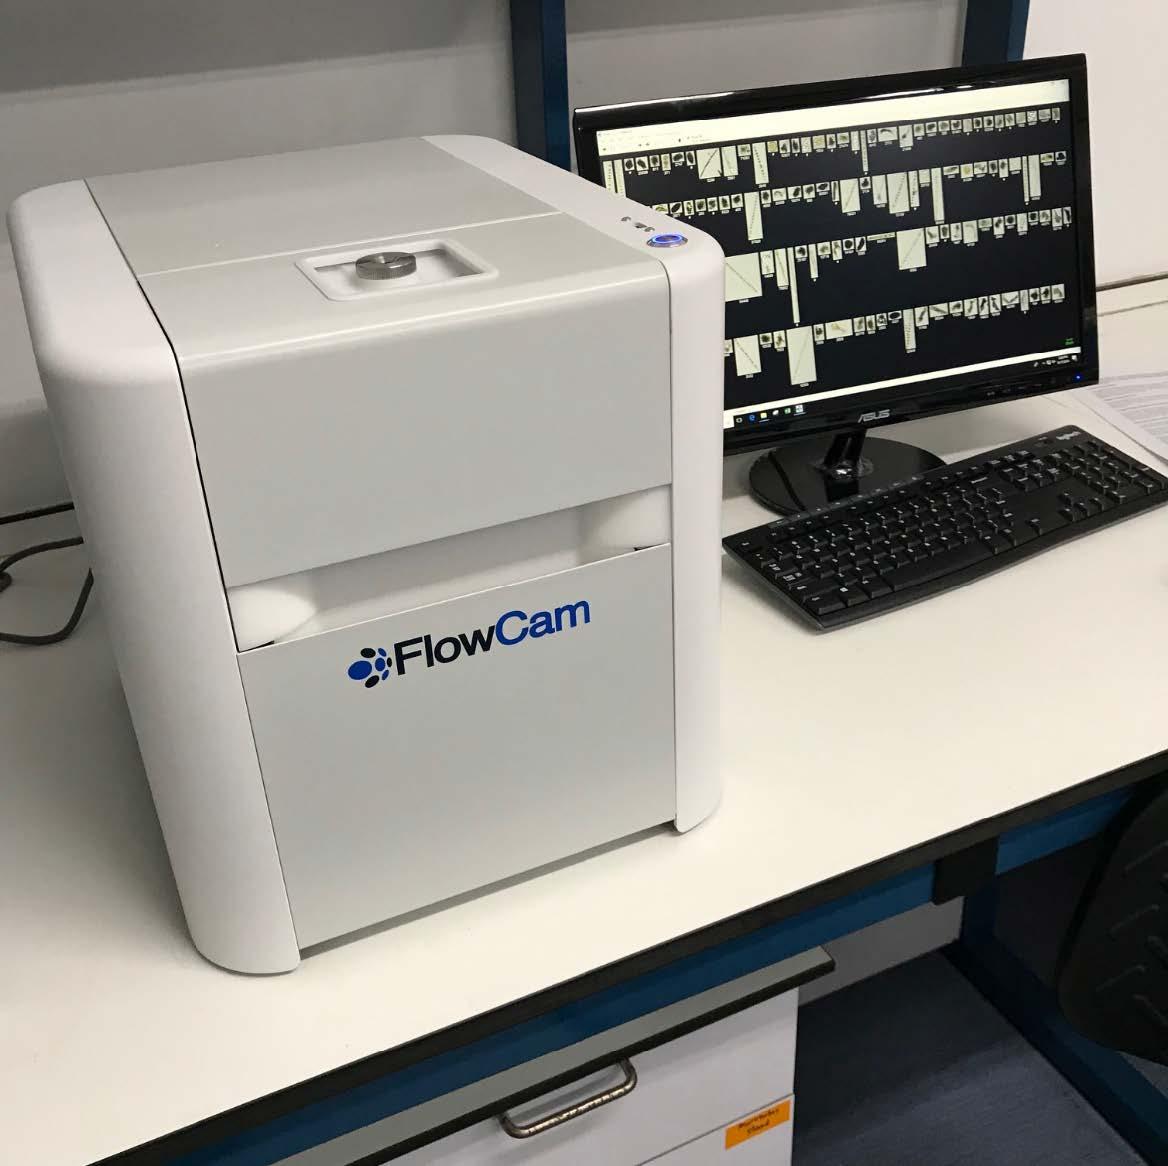 The FlowCam 8000